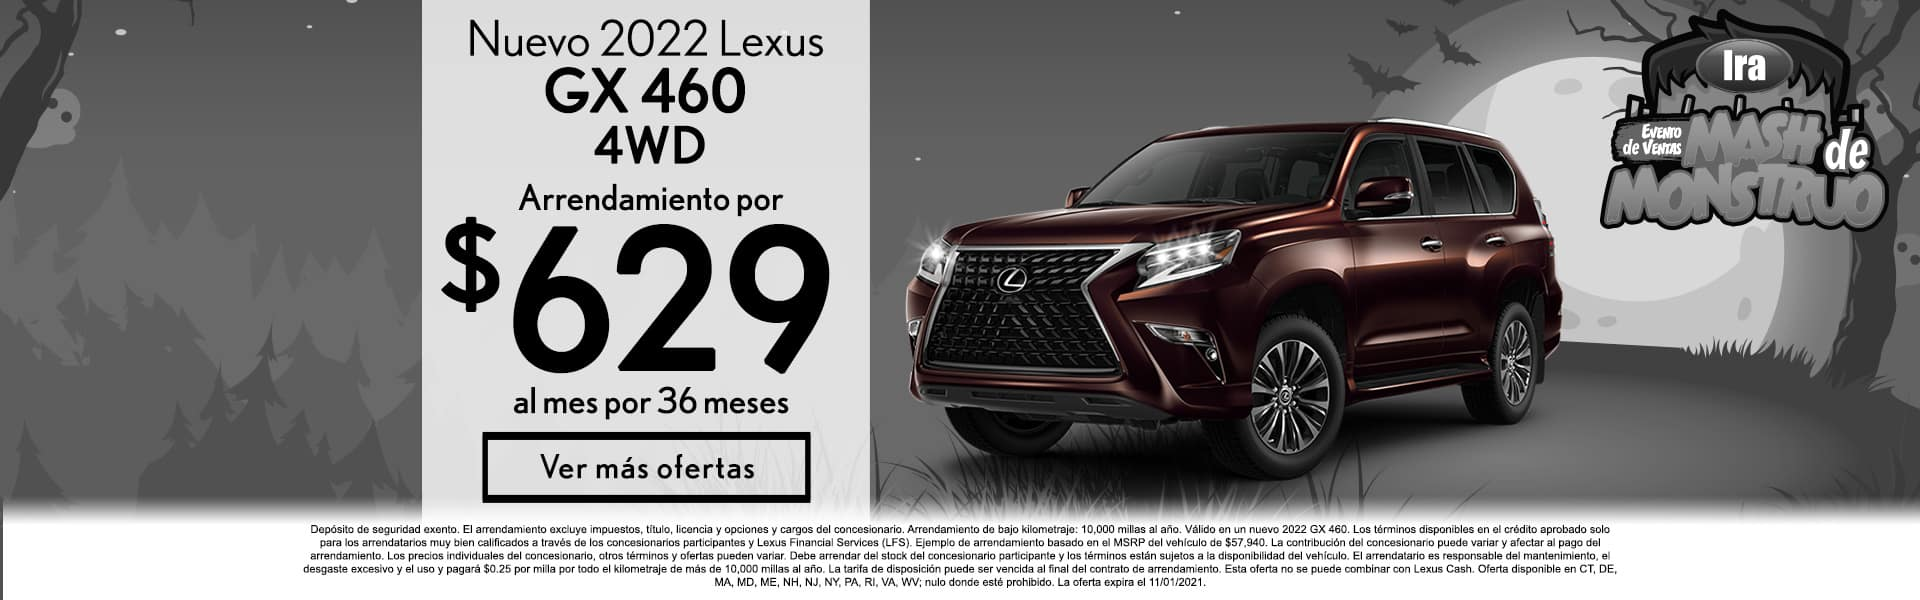 IraLexusManchester_SpanishSlide_1900x600_GX460_10-21